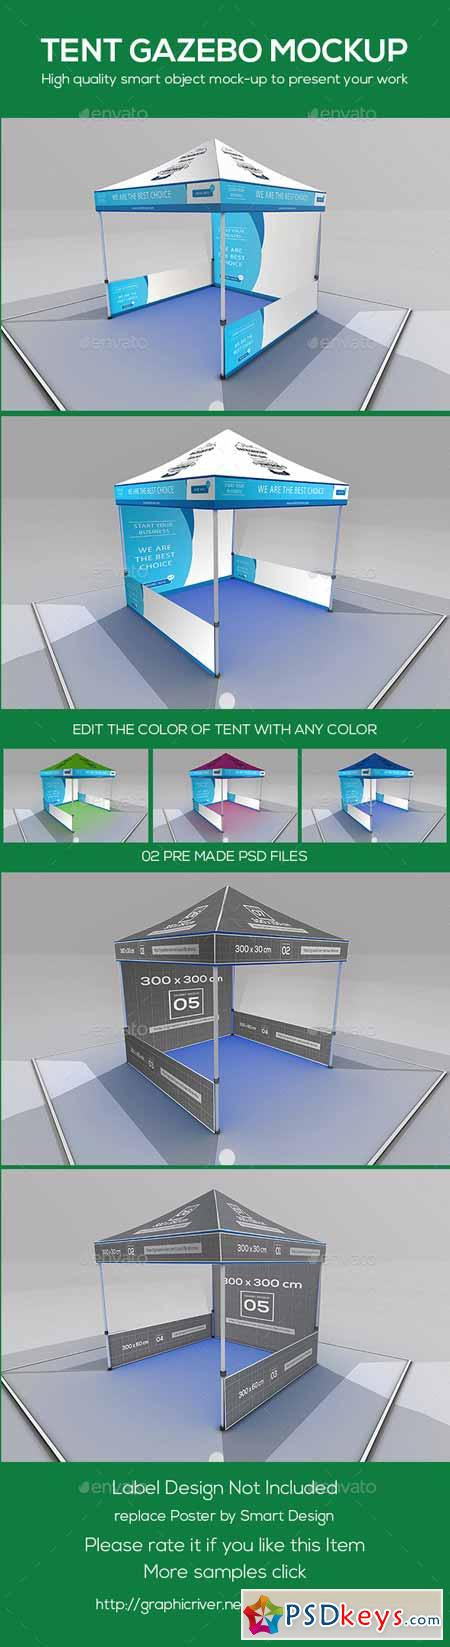 Tent Gazebo Mockup 9680377 » Free Download Photoshop Vector Stock